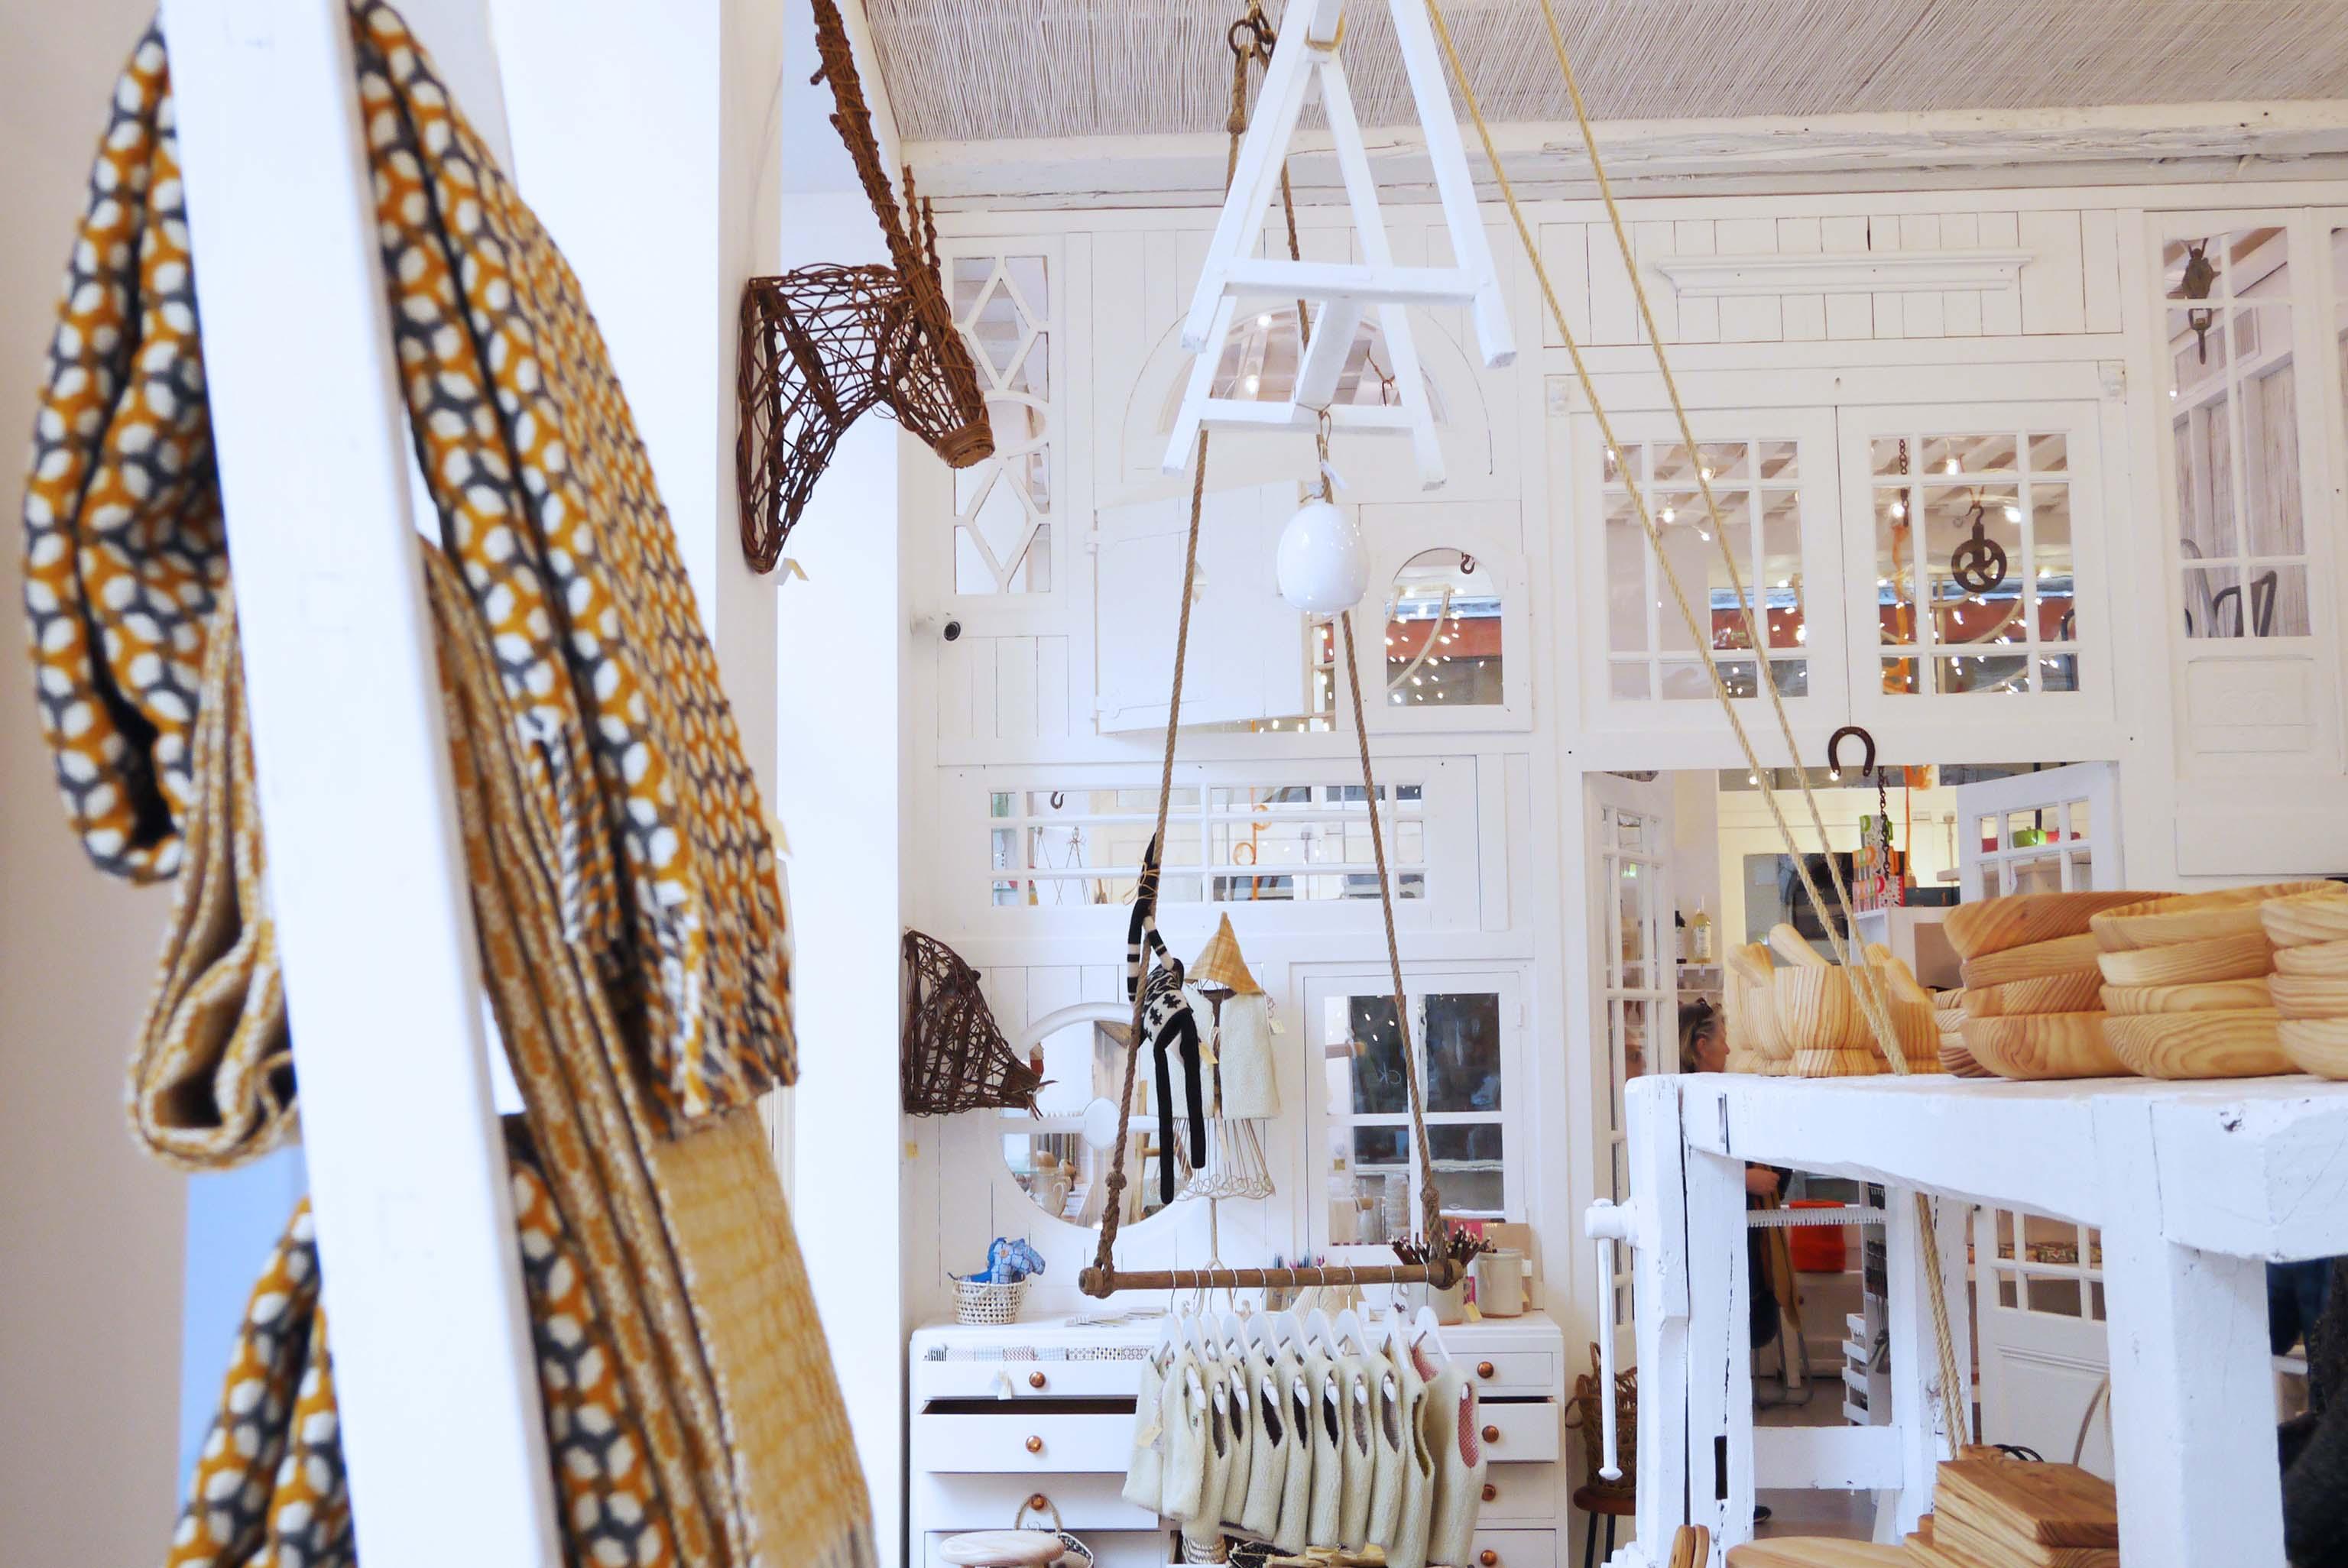 artisanat marocain lyon - Artisanat et commerce equitable